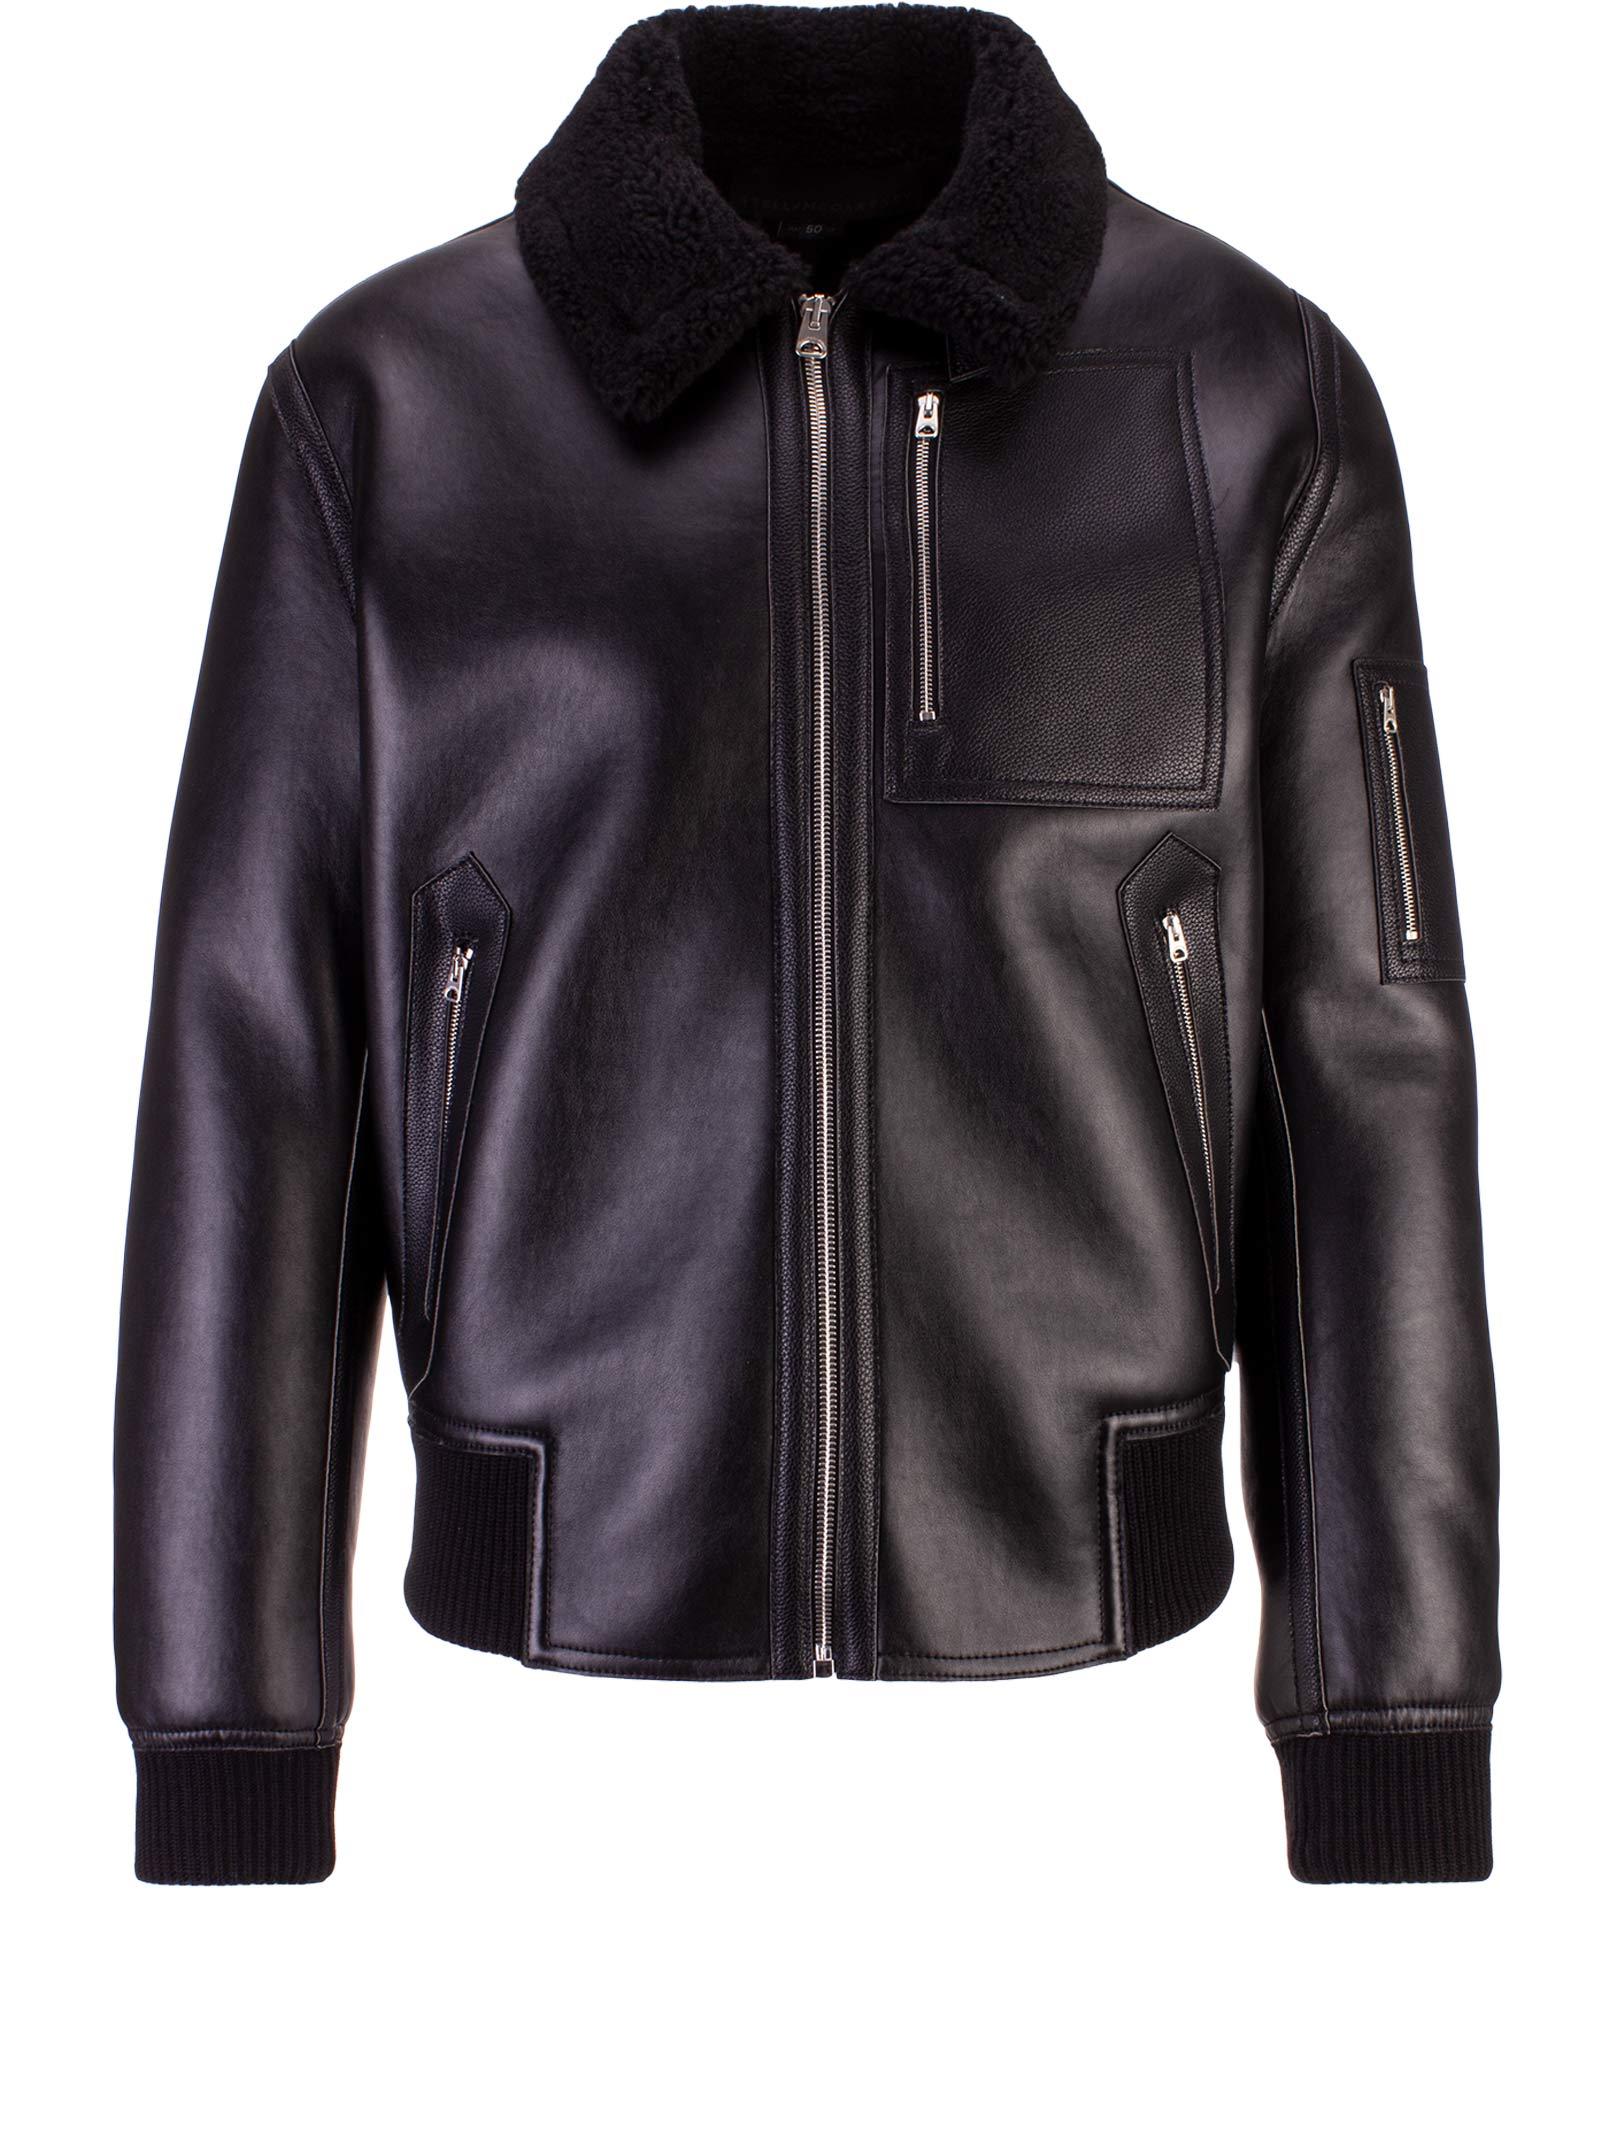 Stella Mccartney Jacket